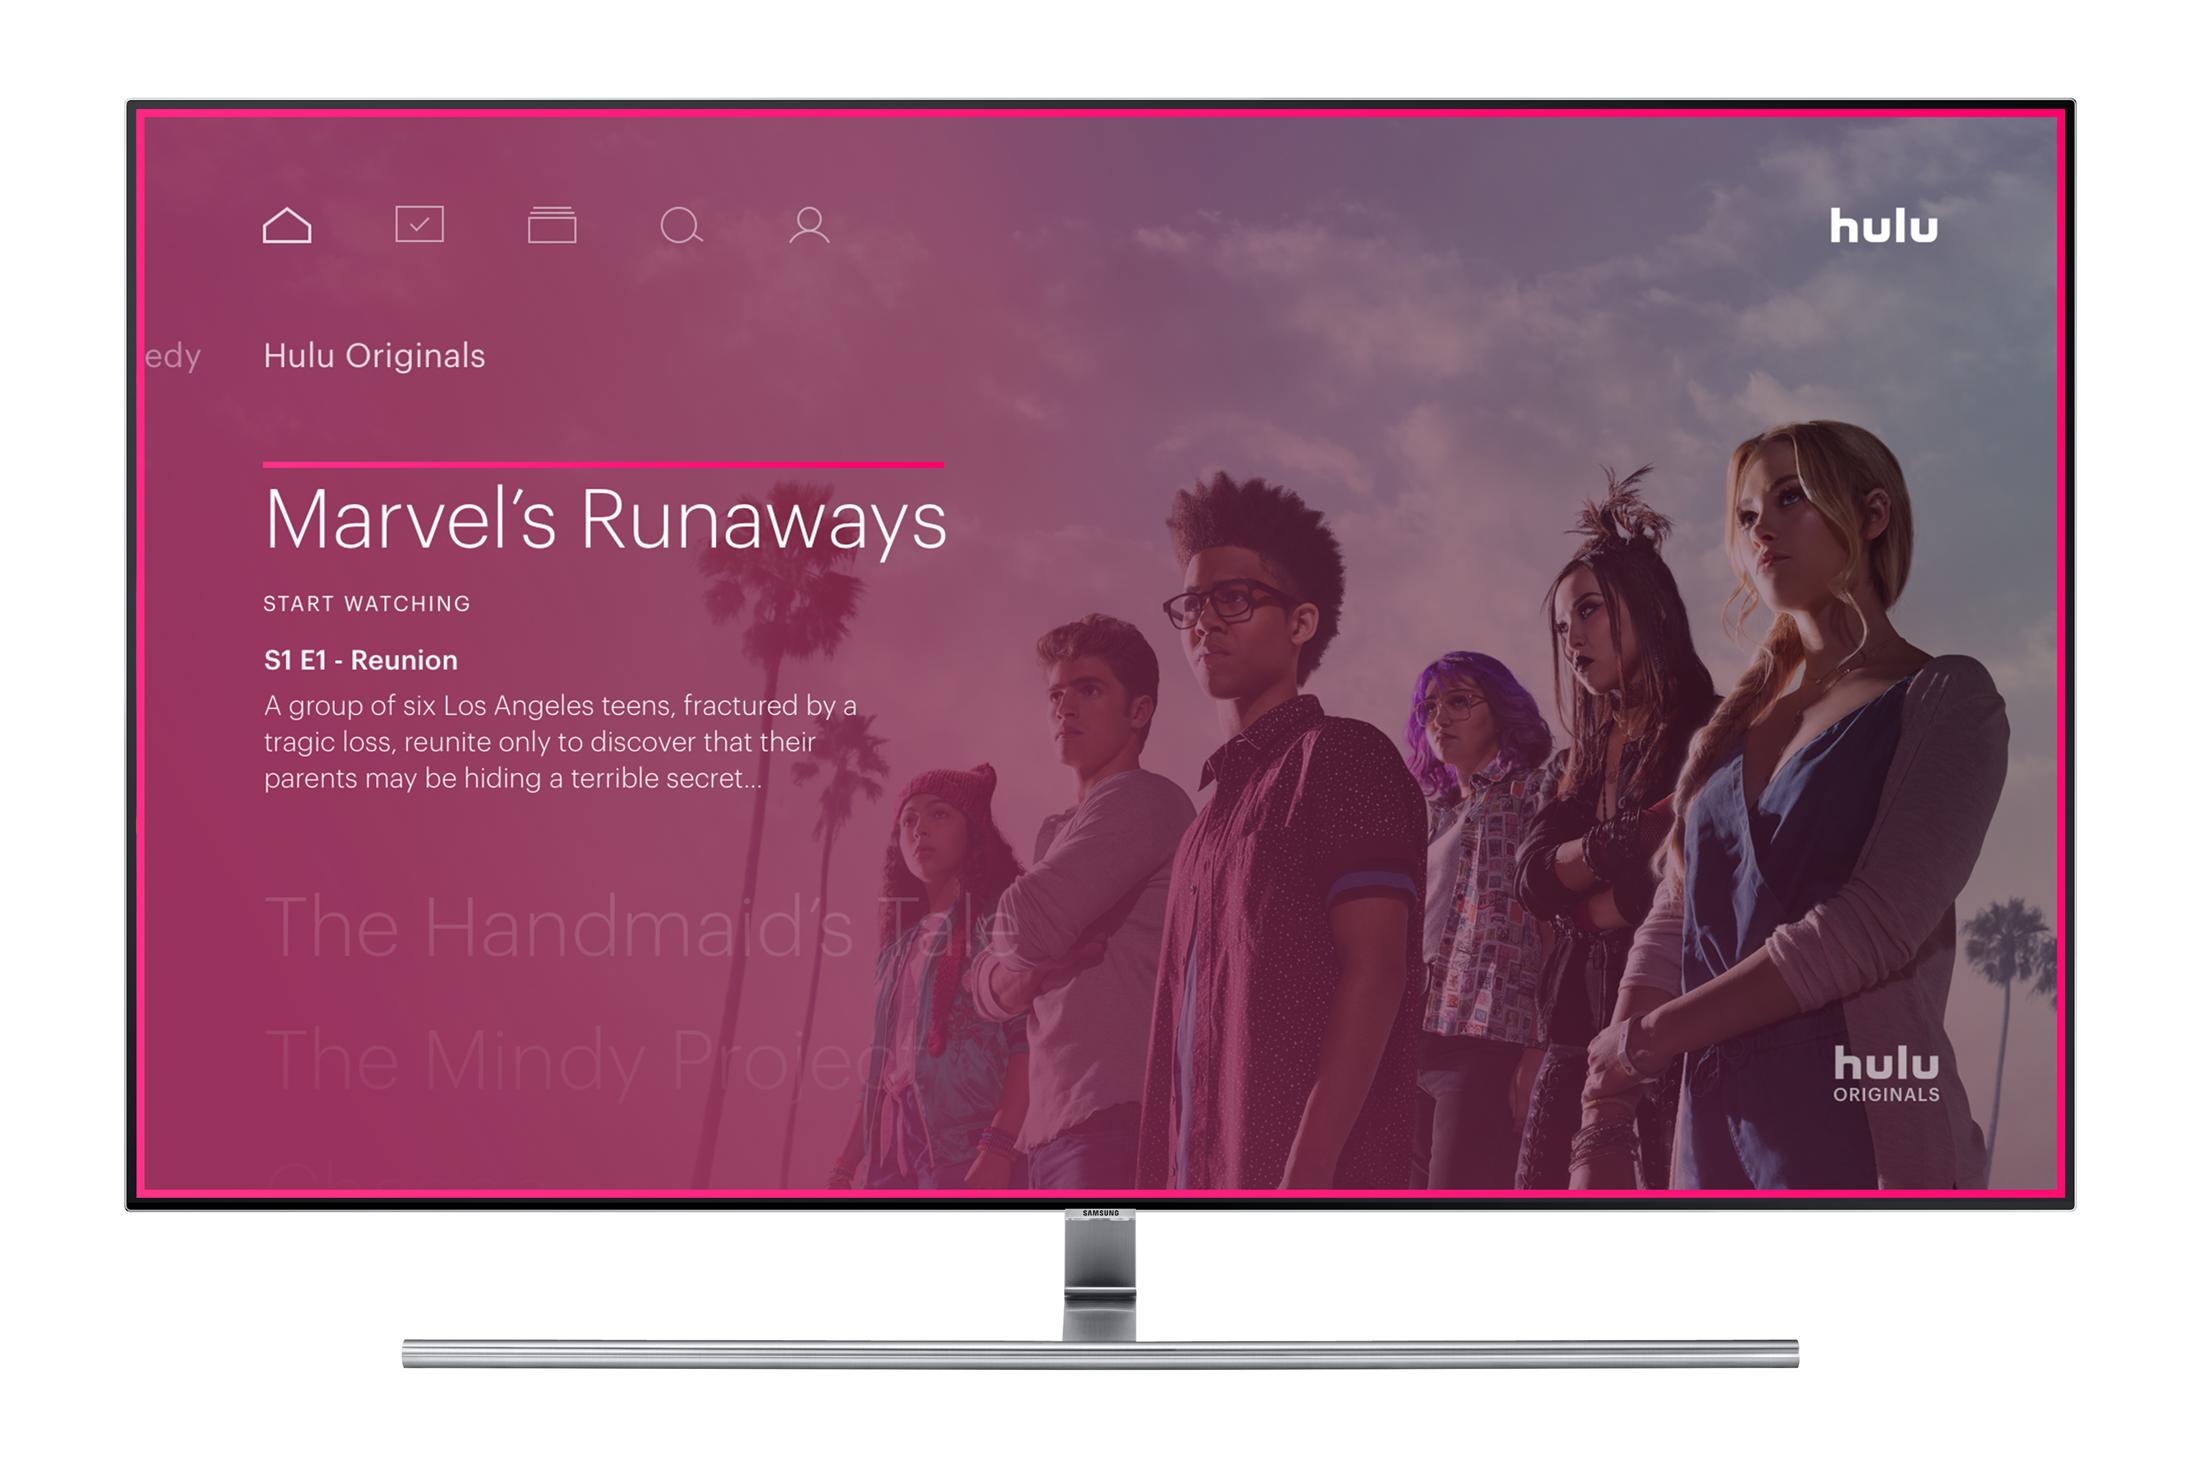 A screen shot of Hulu original series Marvel's Runaways